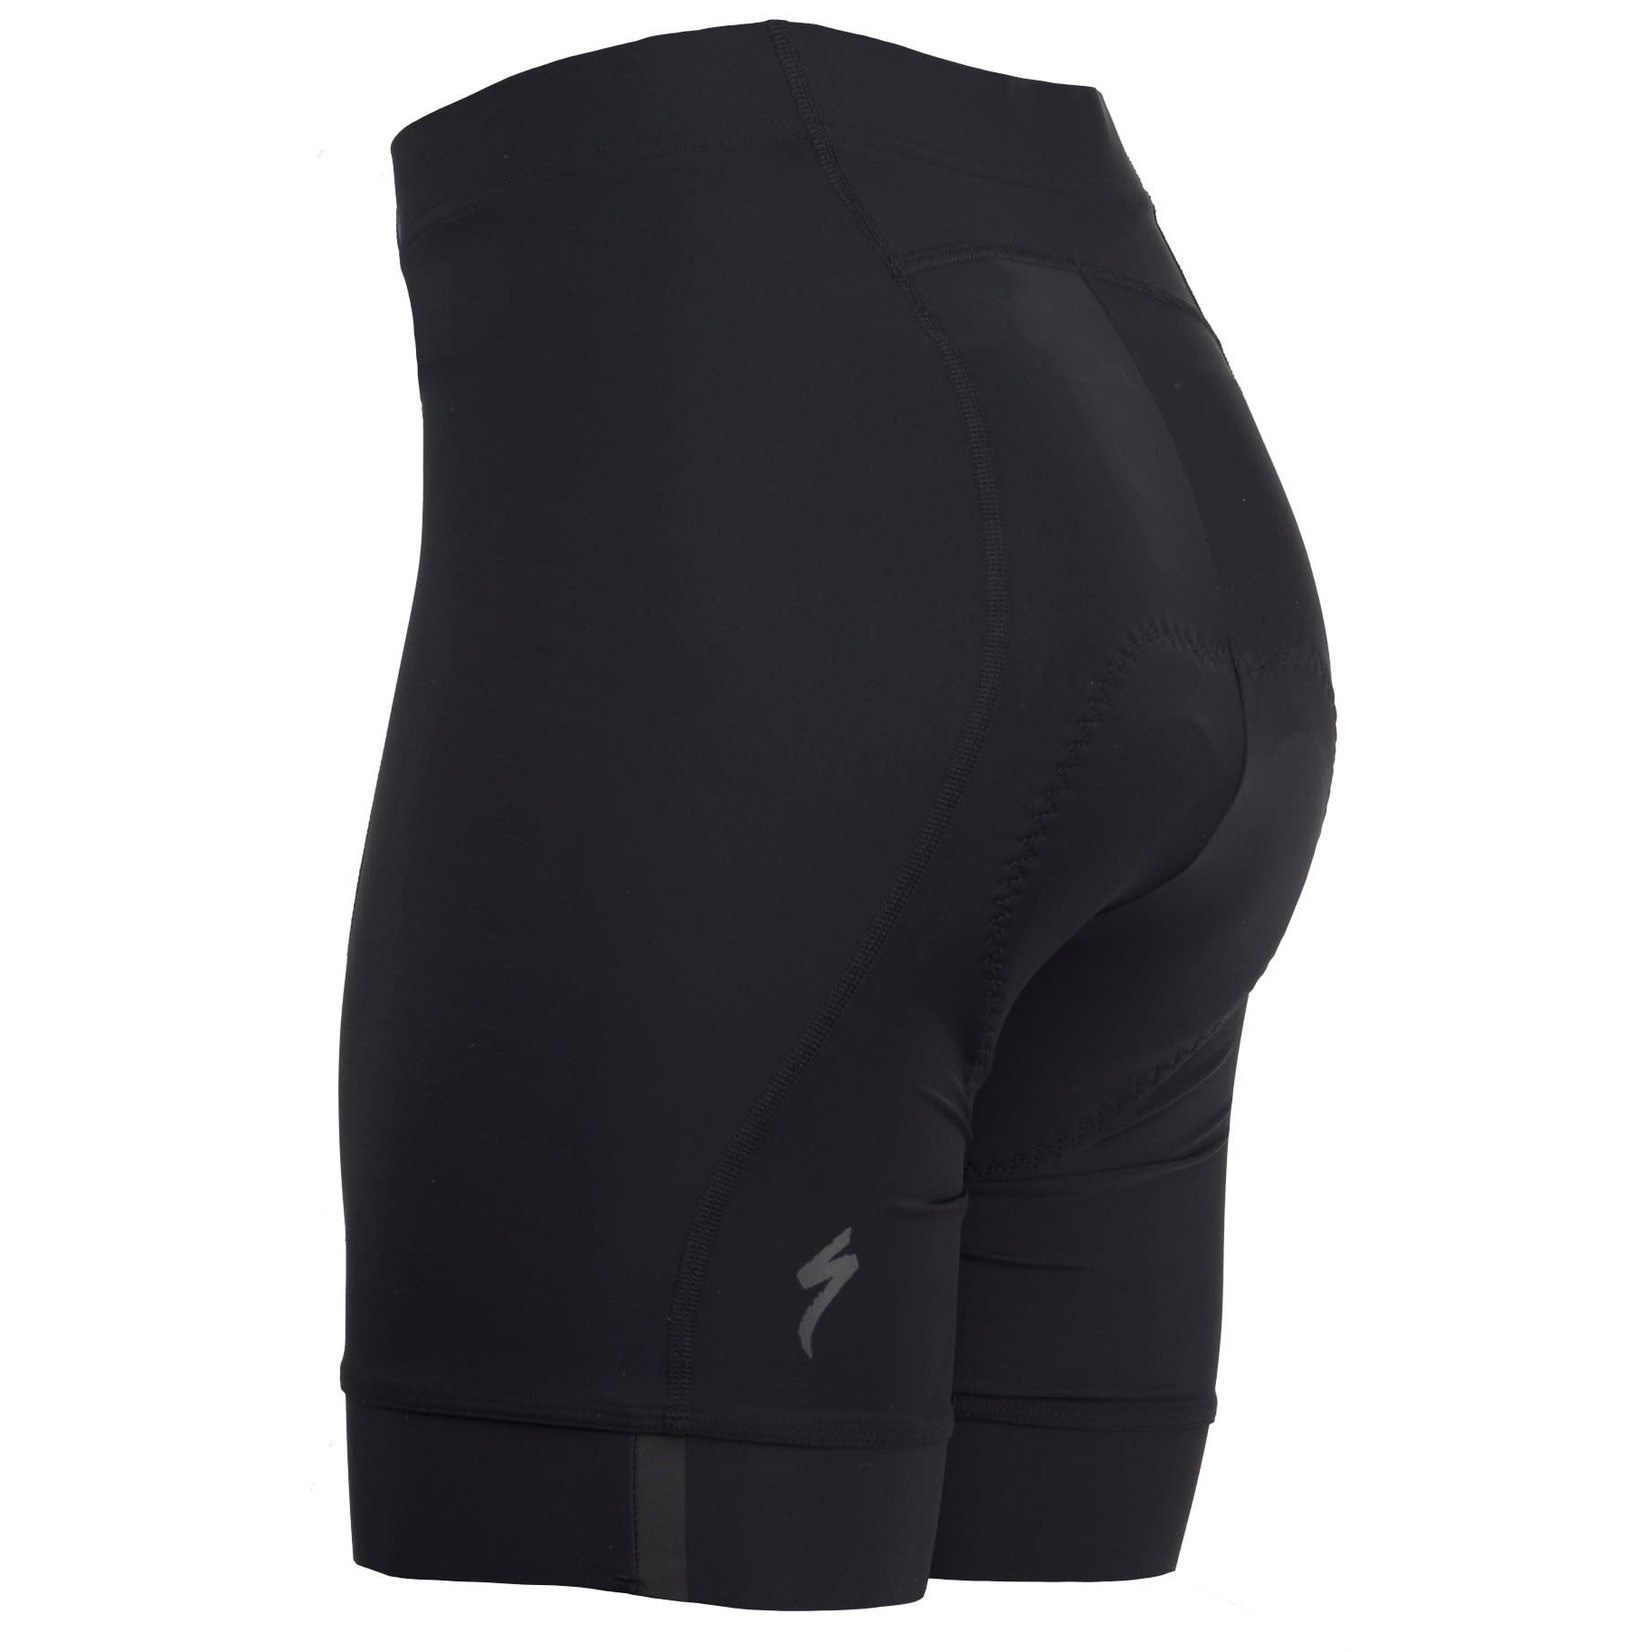 Specialized RBX WMNS Short Black Medium